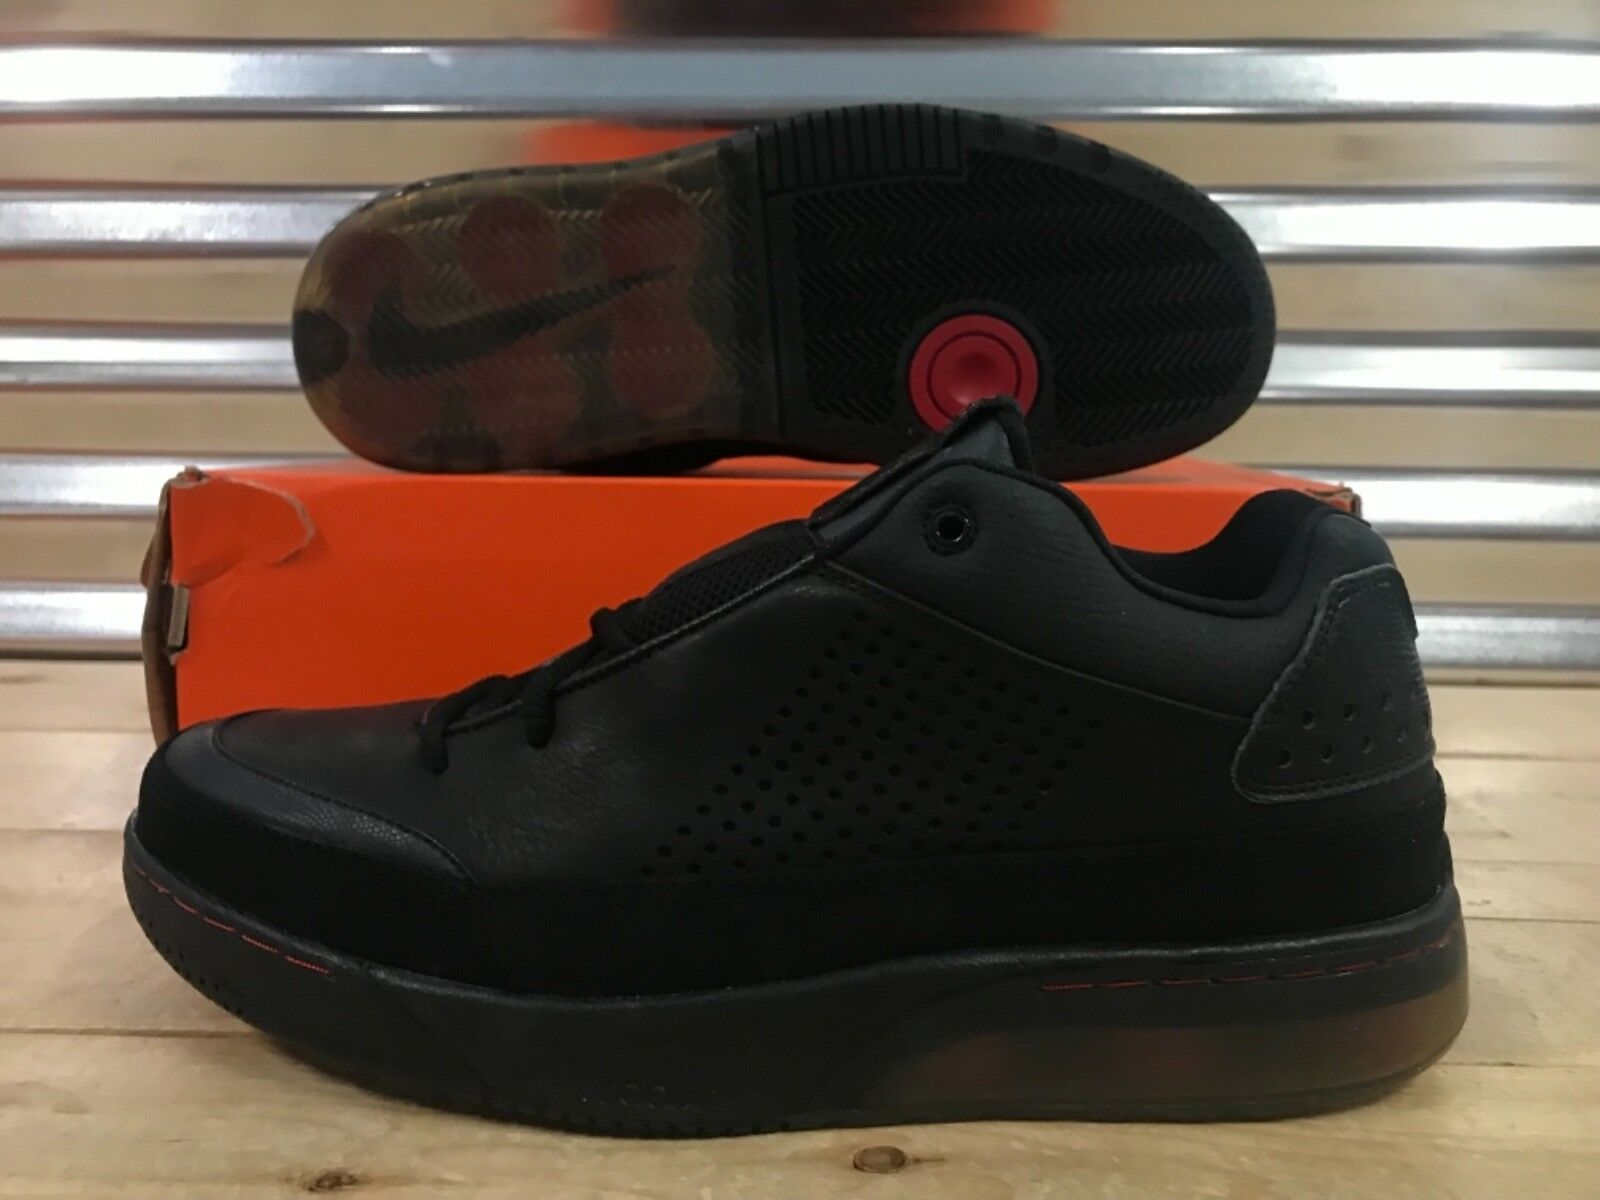 Nike Shox Spotlight Low Retro 2007 2007 2007 scarpe nero Varsity rosso SZ 11 ( 316531-001 ) 213f3a